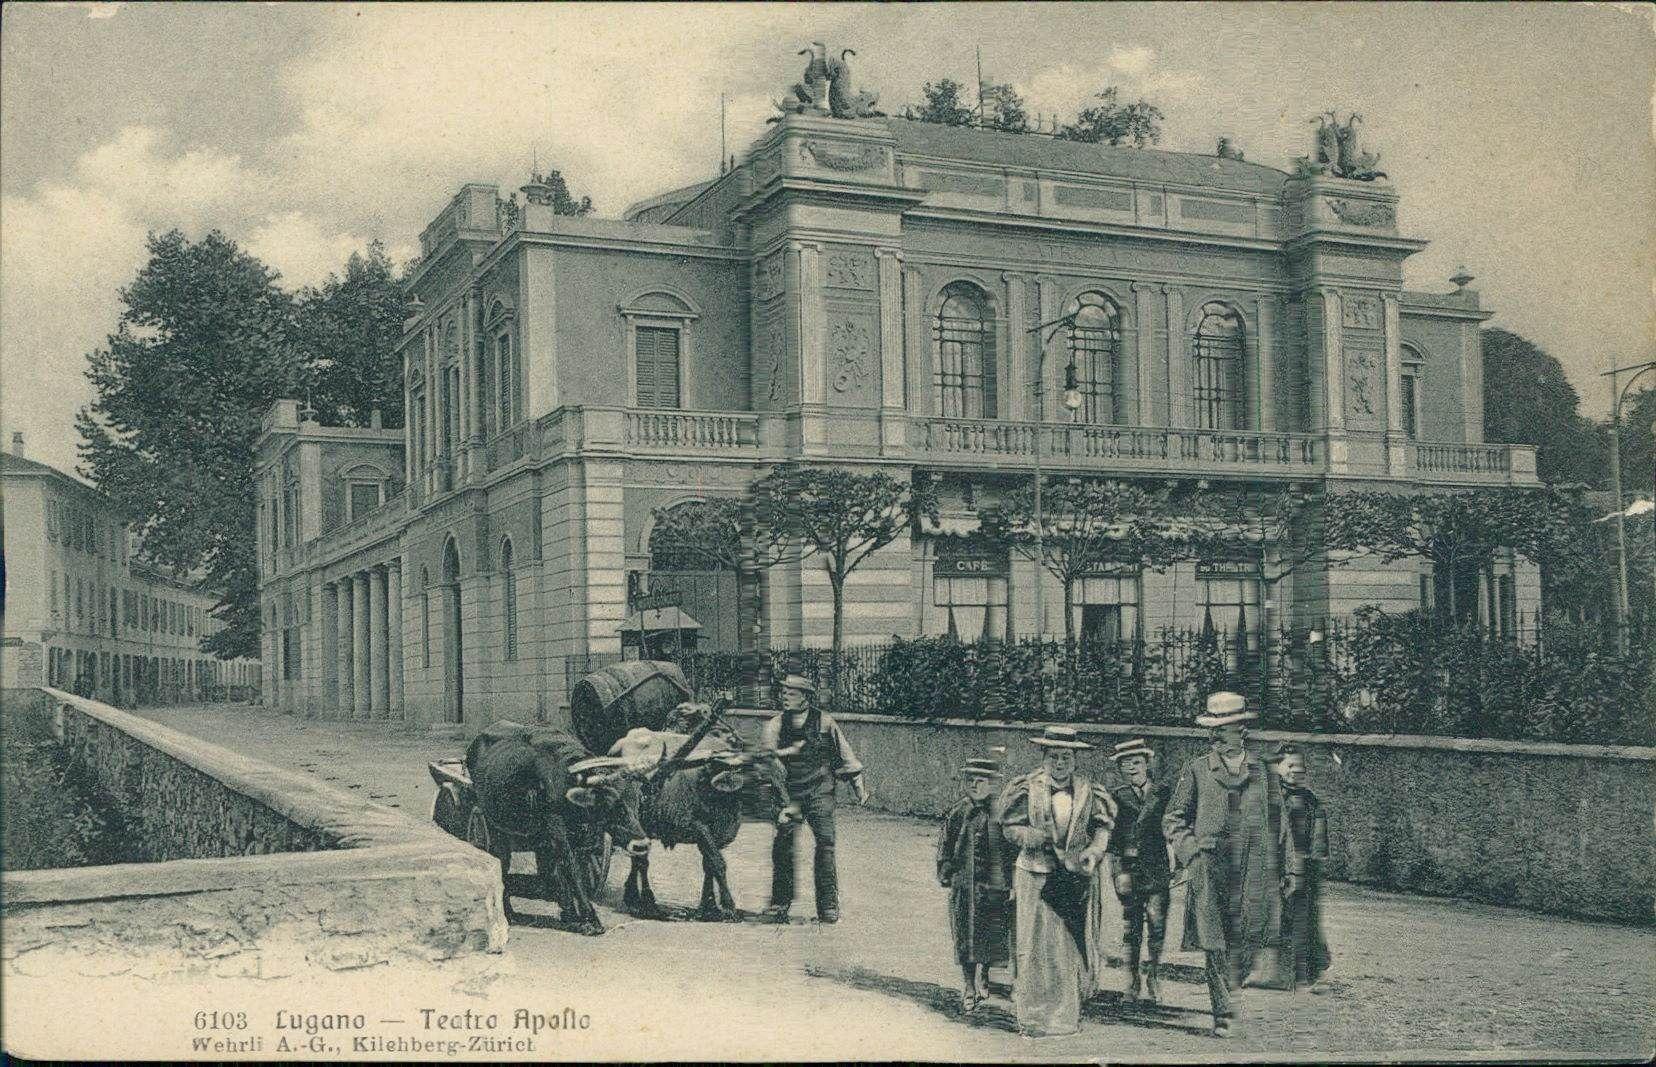 Carte postale, Vue antique du «Teatro Apollo» de Lugano